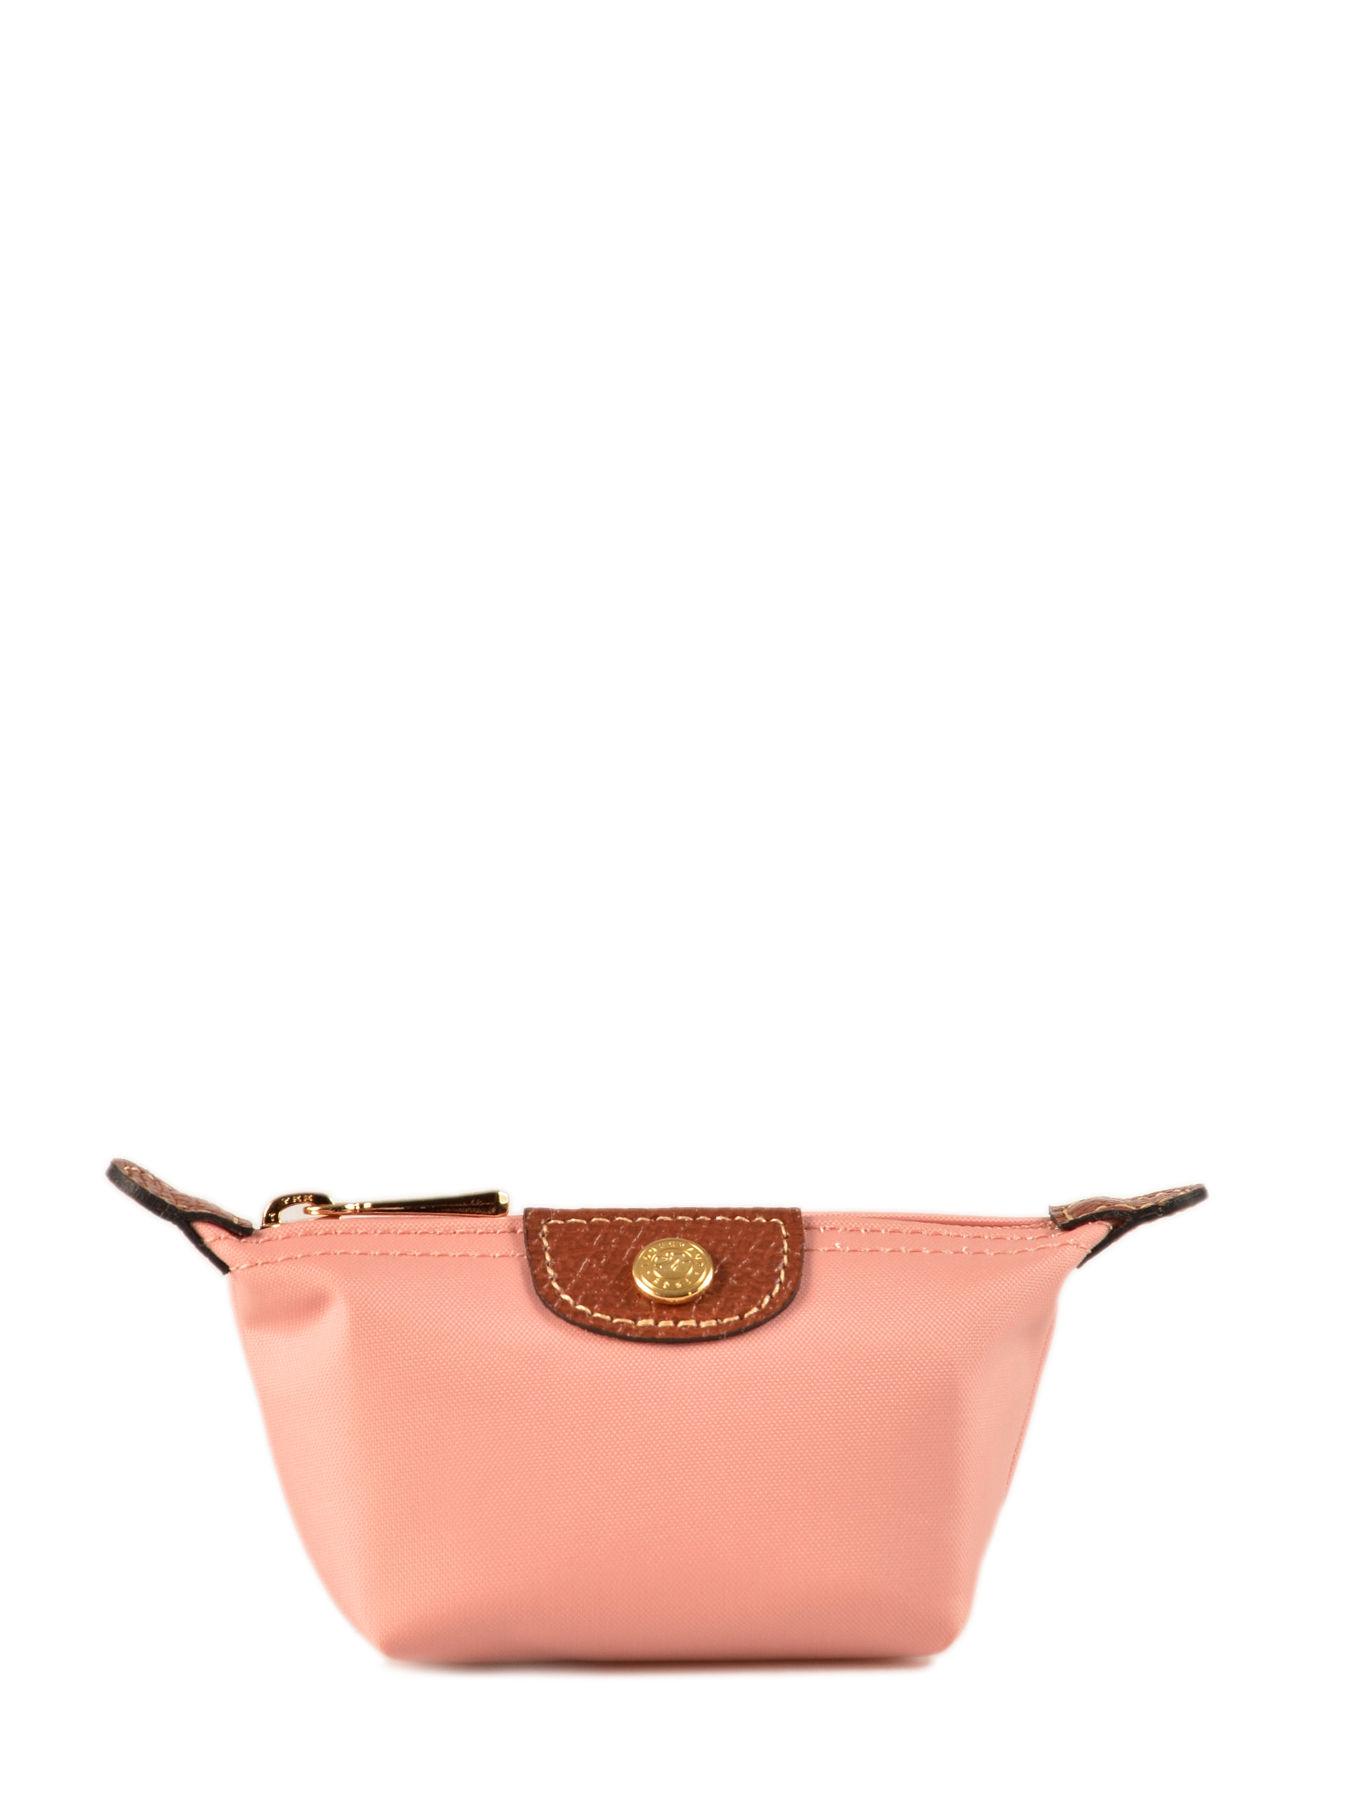 Longchamp Porte monnaie Rose